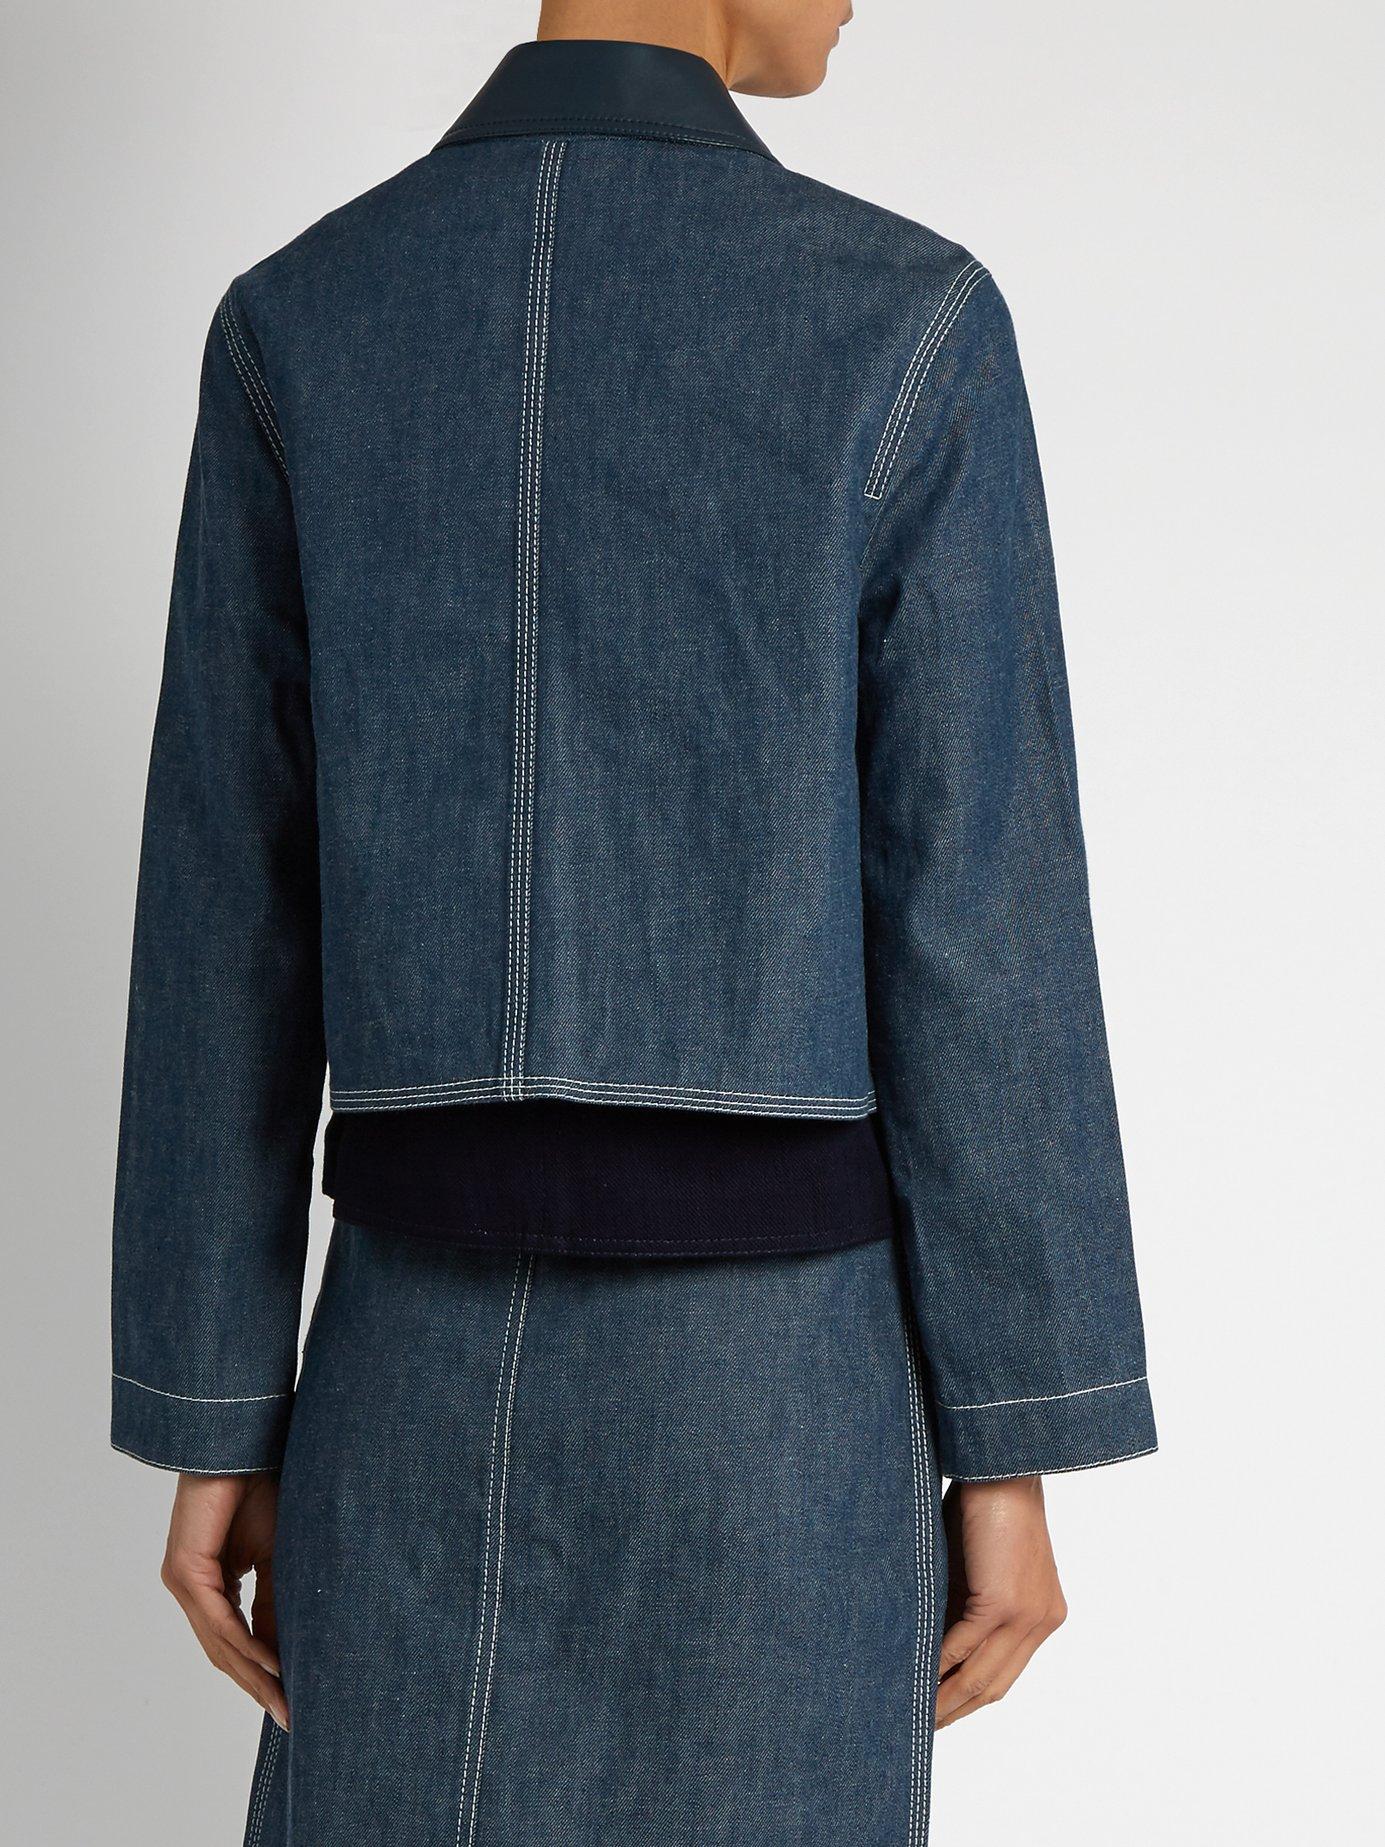 Point-collar patch-pocket denim jacket by Edun